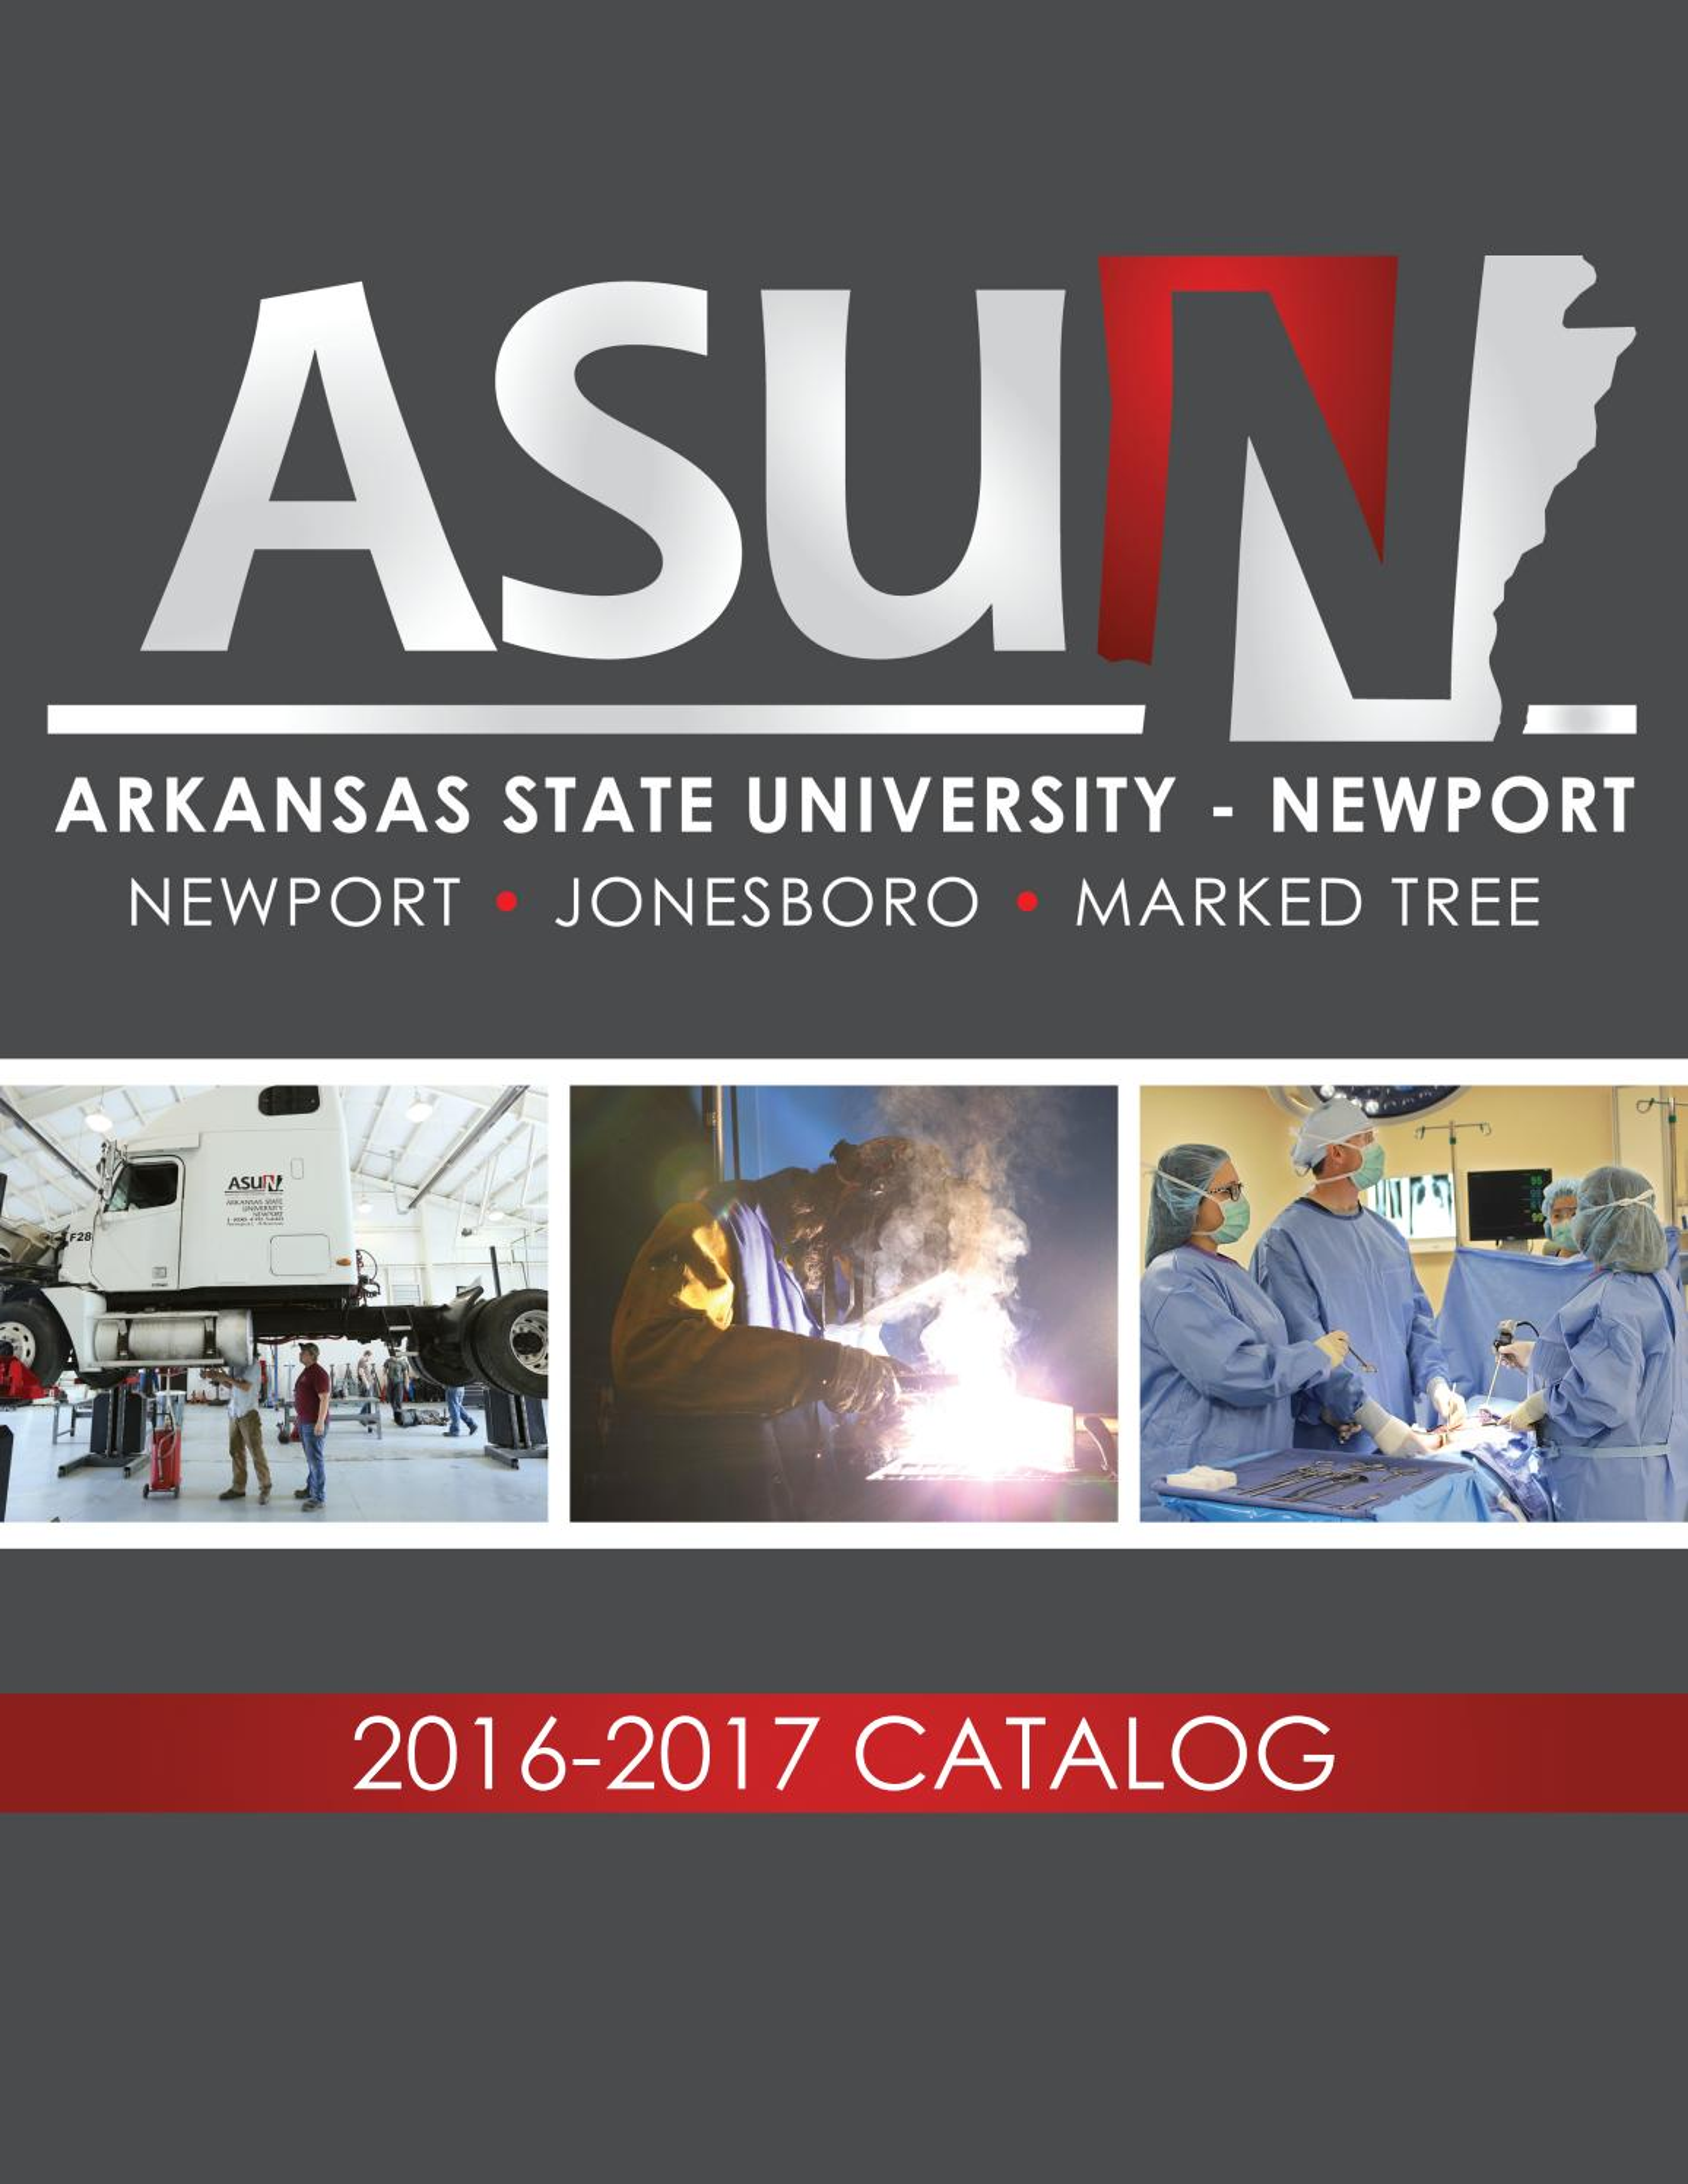 Asu Newport Catalog 2016 2017 By Asunewport Issuu